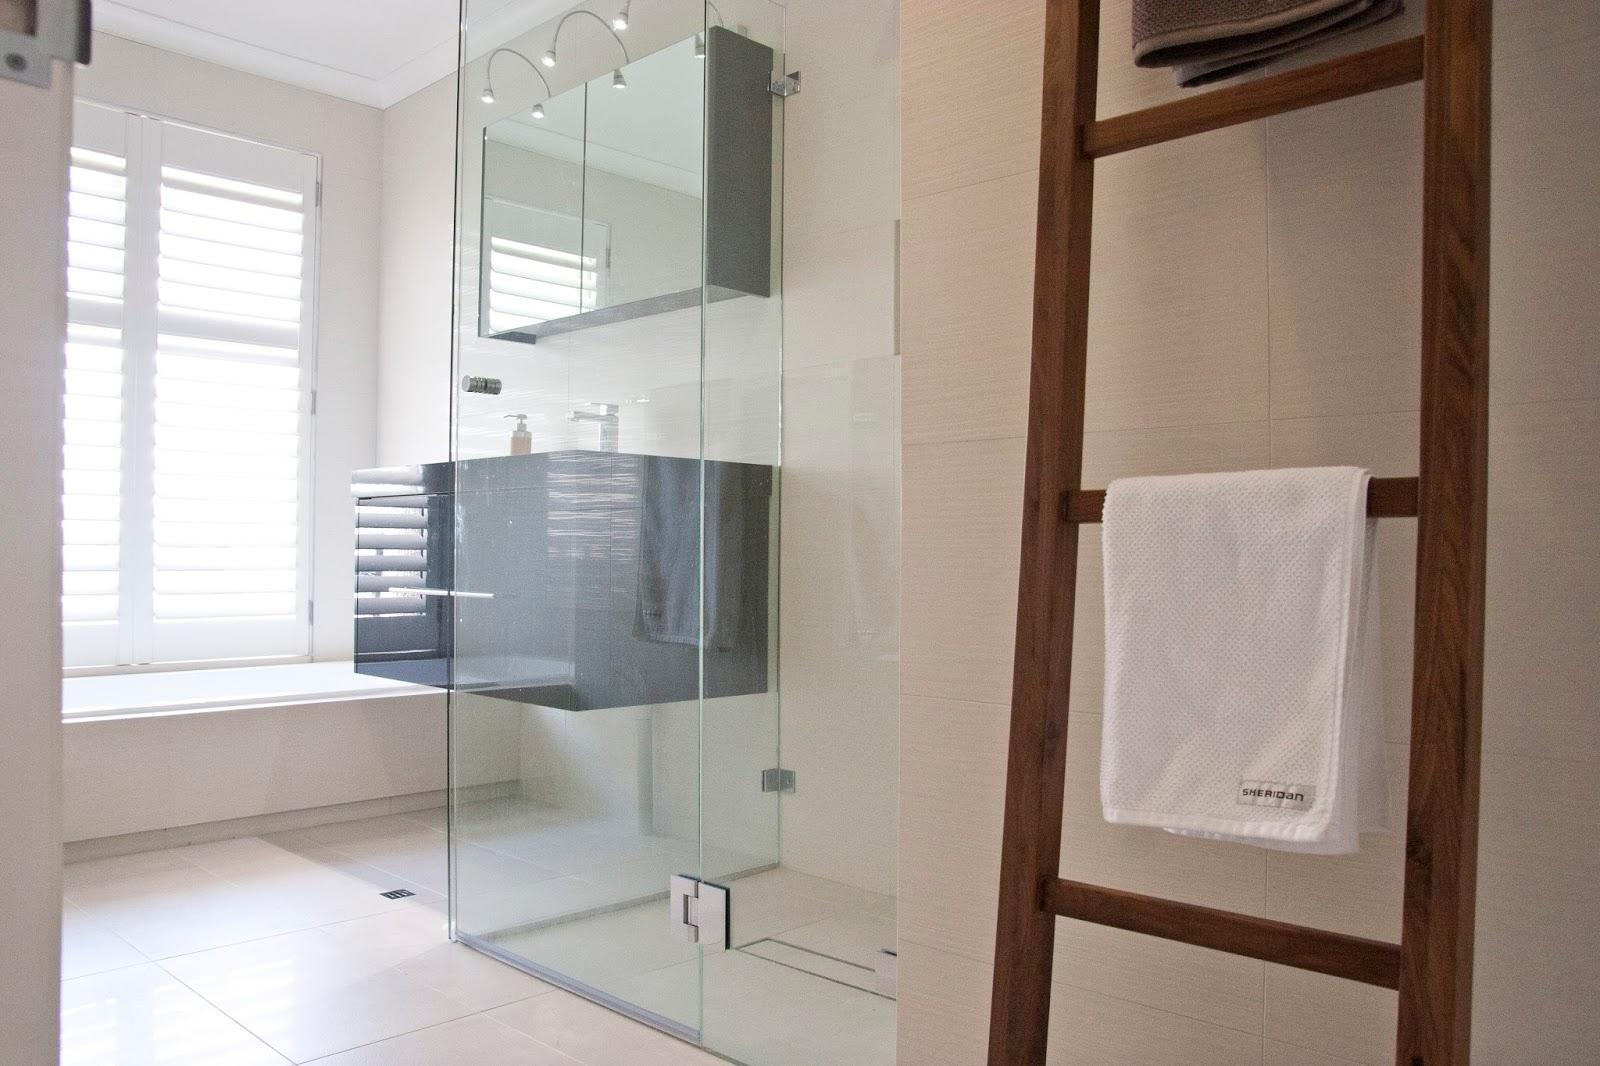 Bathroom designers perth - Some Of Our Bathroom Designs